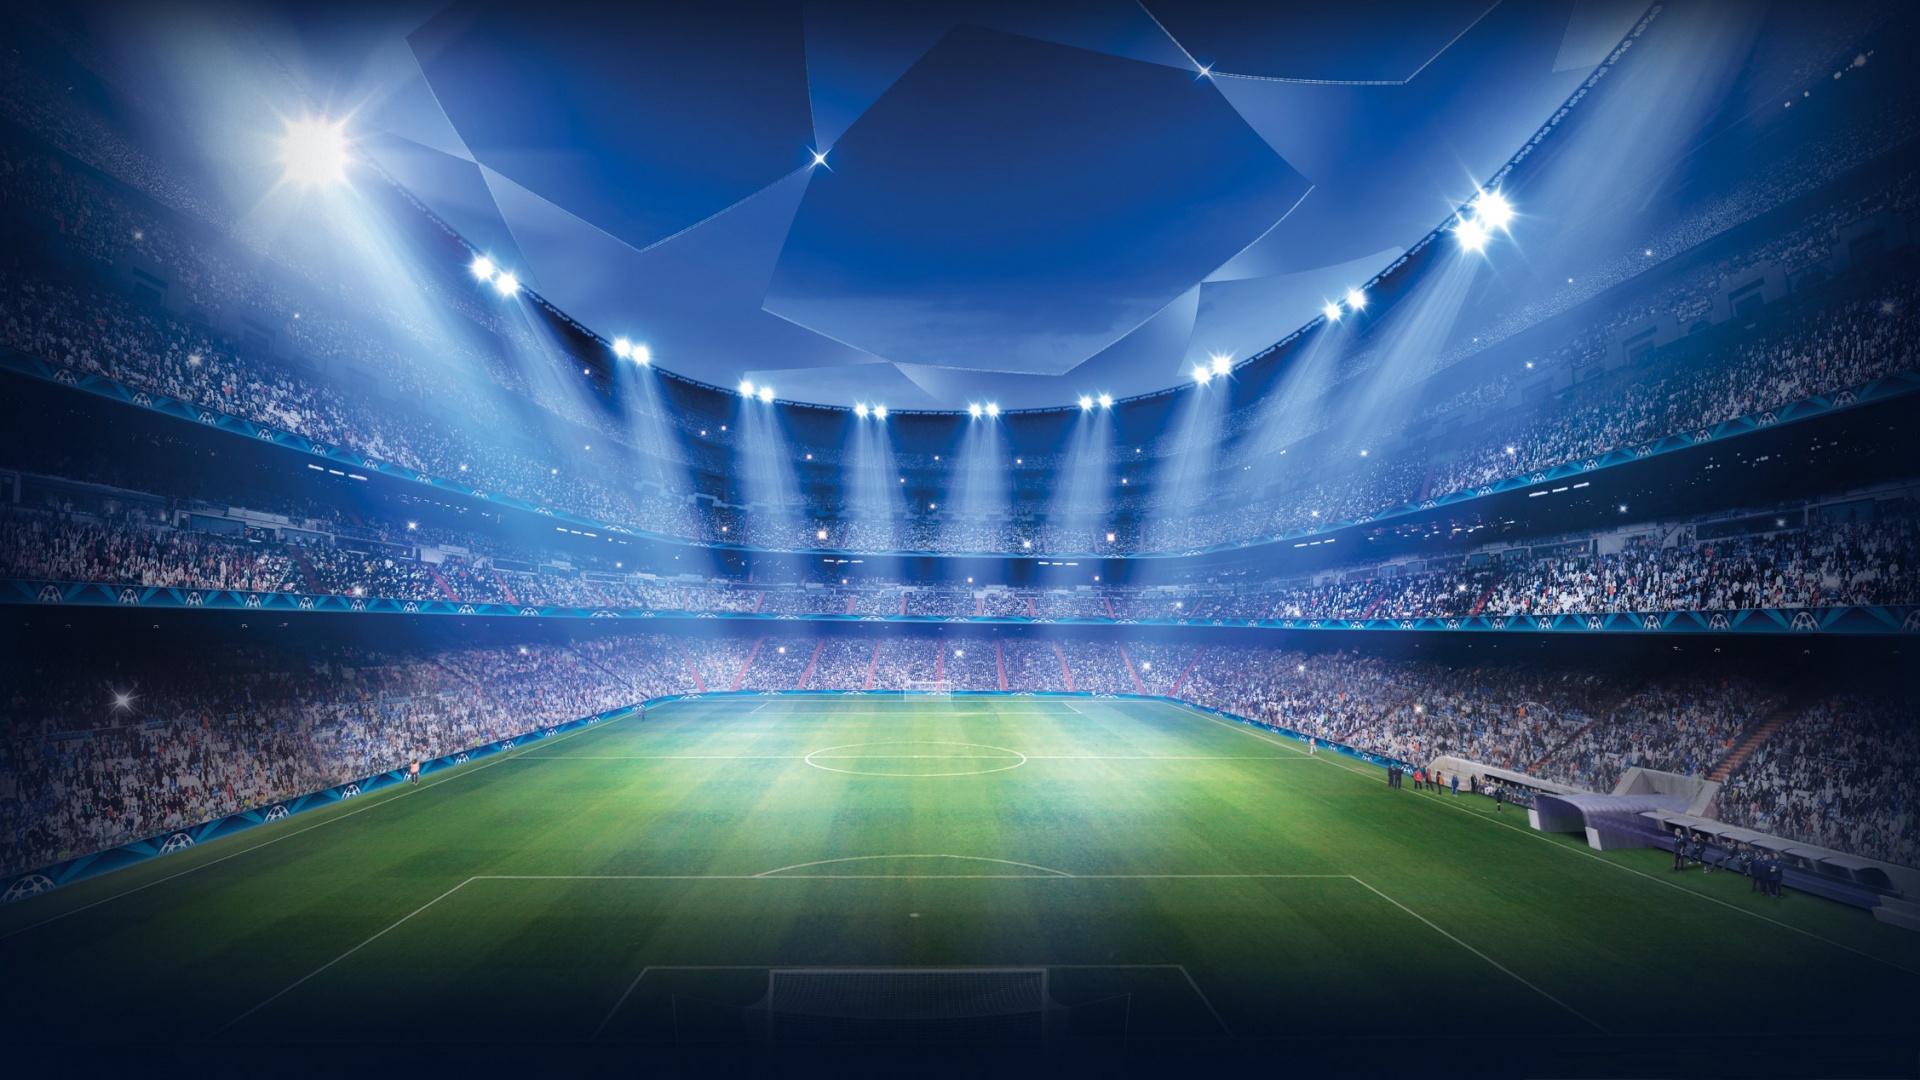 hd wallpaper football stadium wallpapers55com   Best Wallpapers for 1920x1080